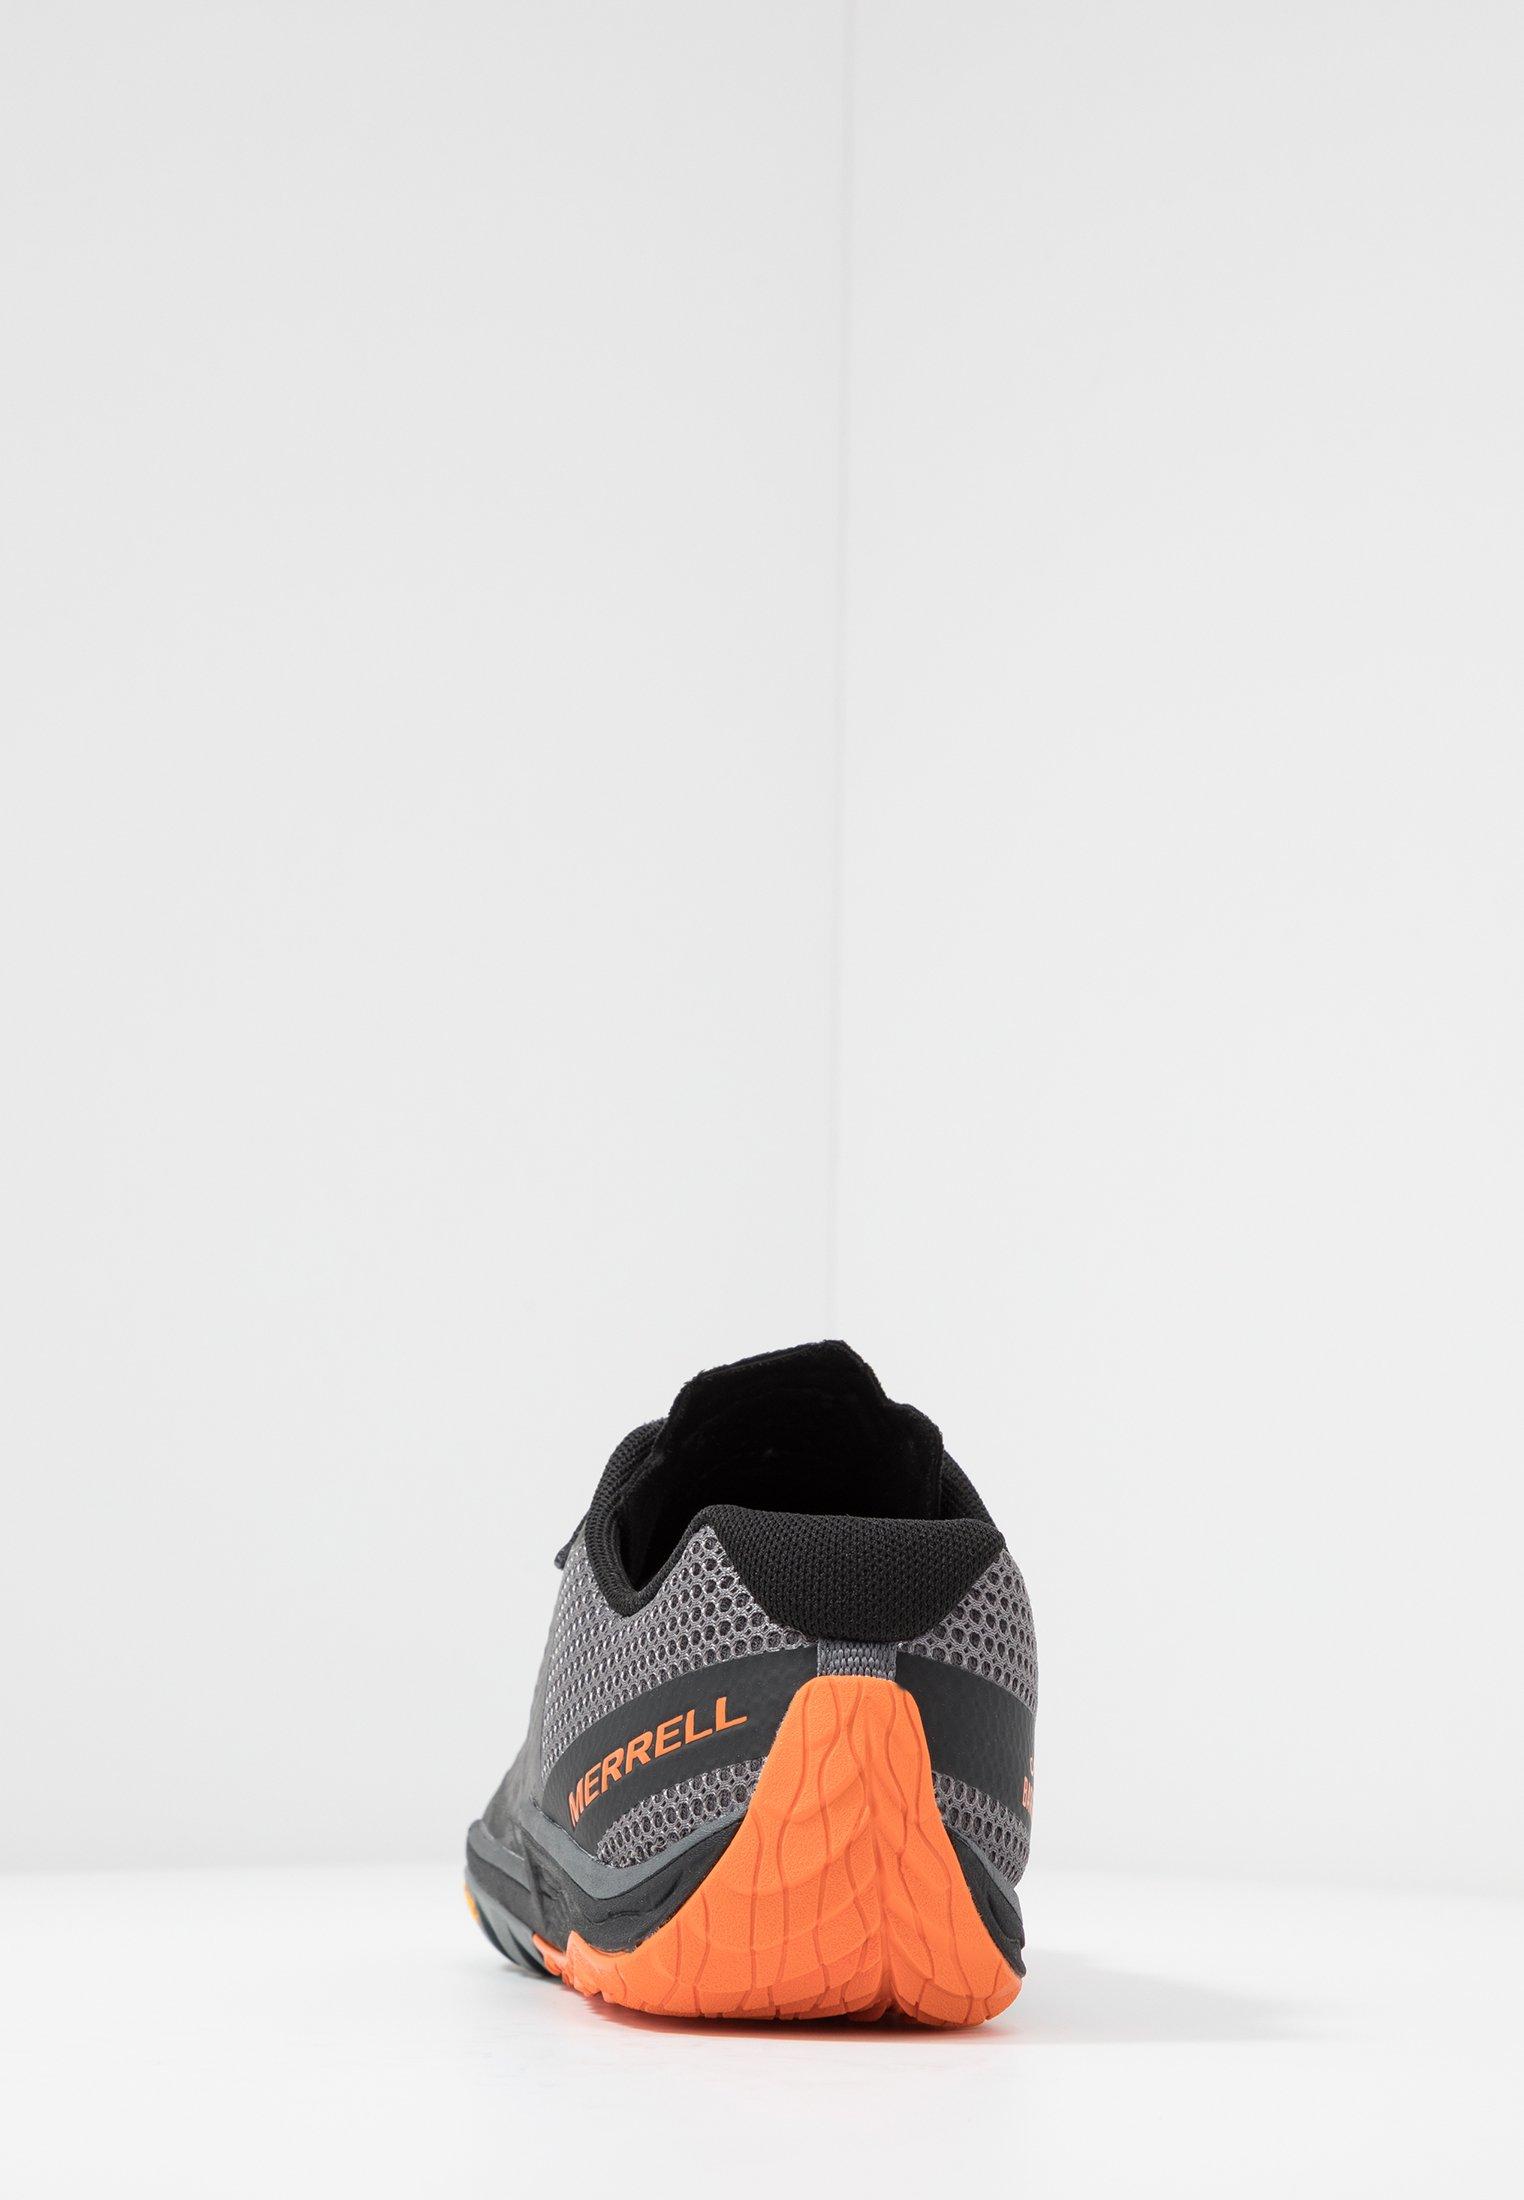 Merrell Trail Glove 5 - Running Shoes Rock